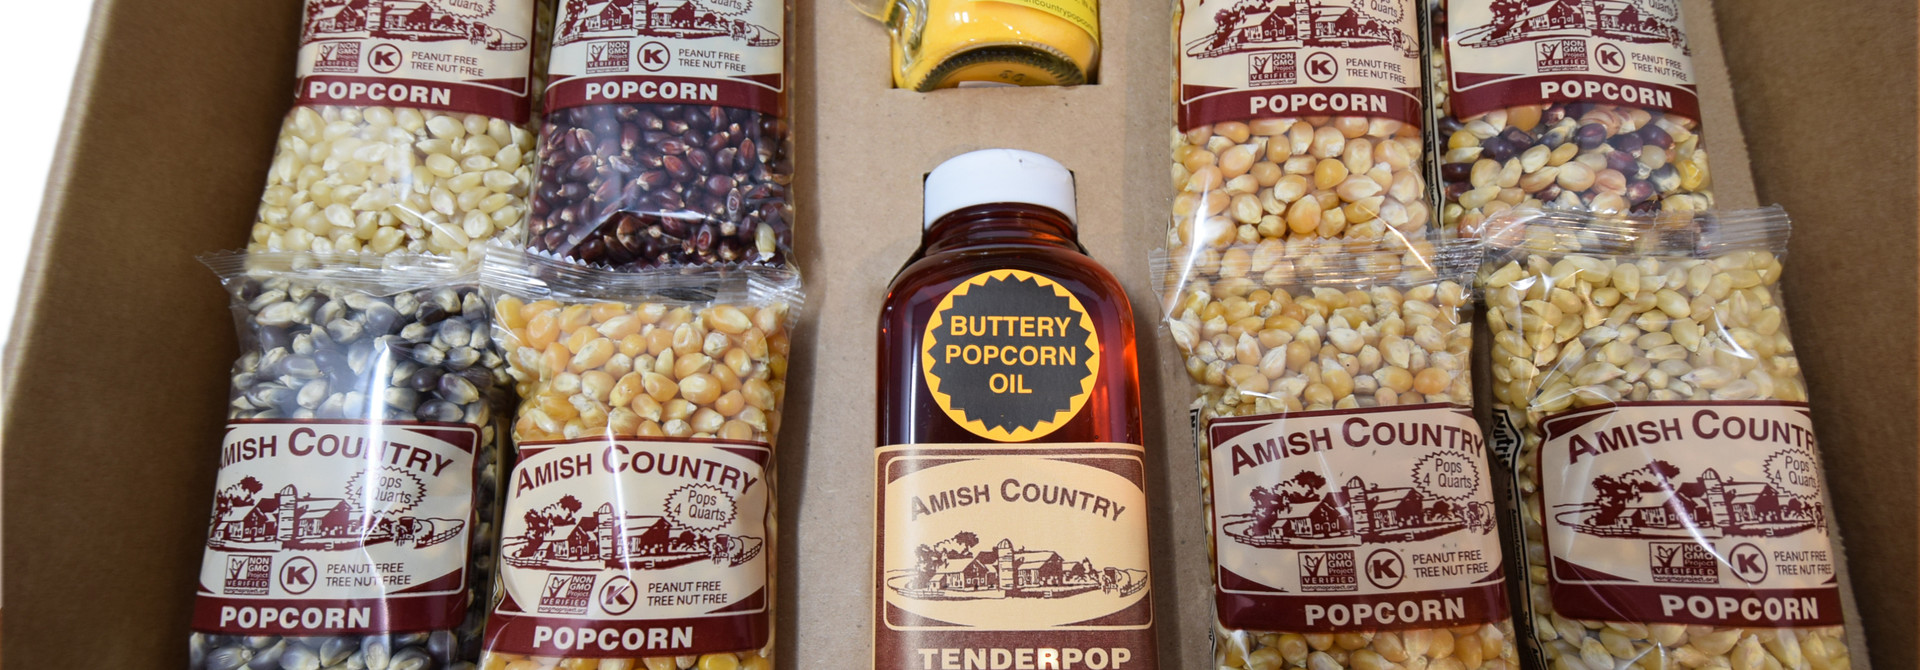 Popcorn Sampler Gift Box